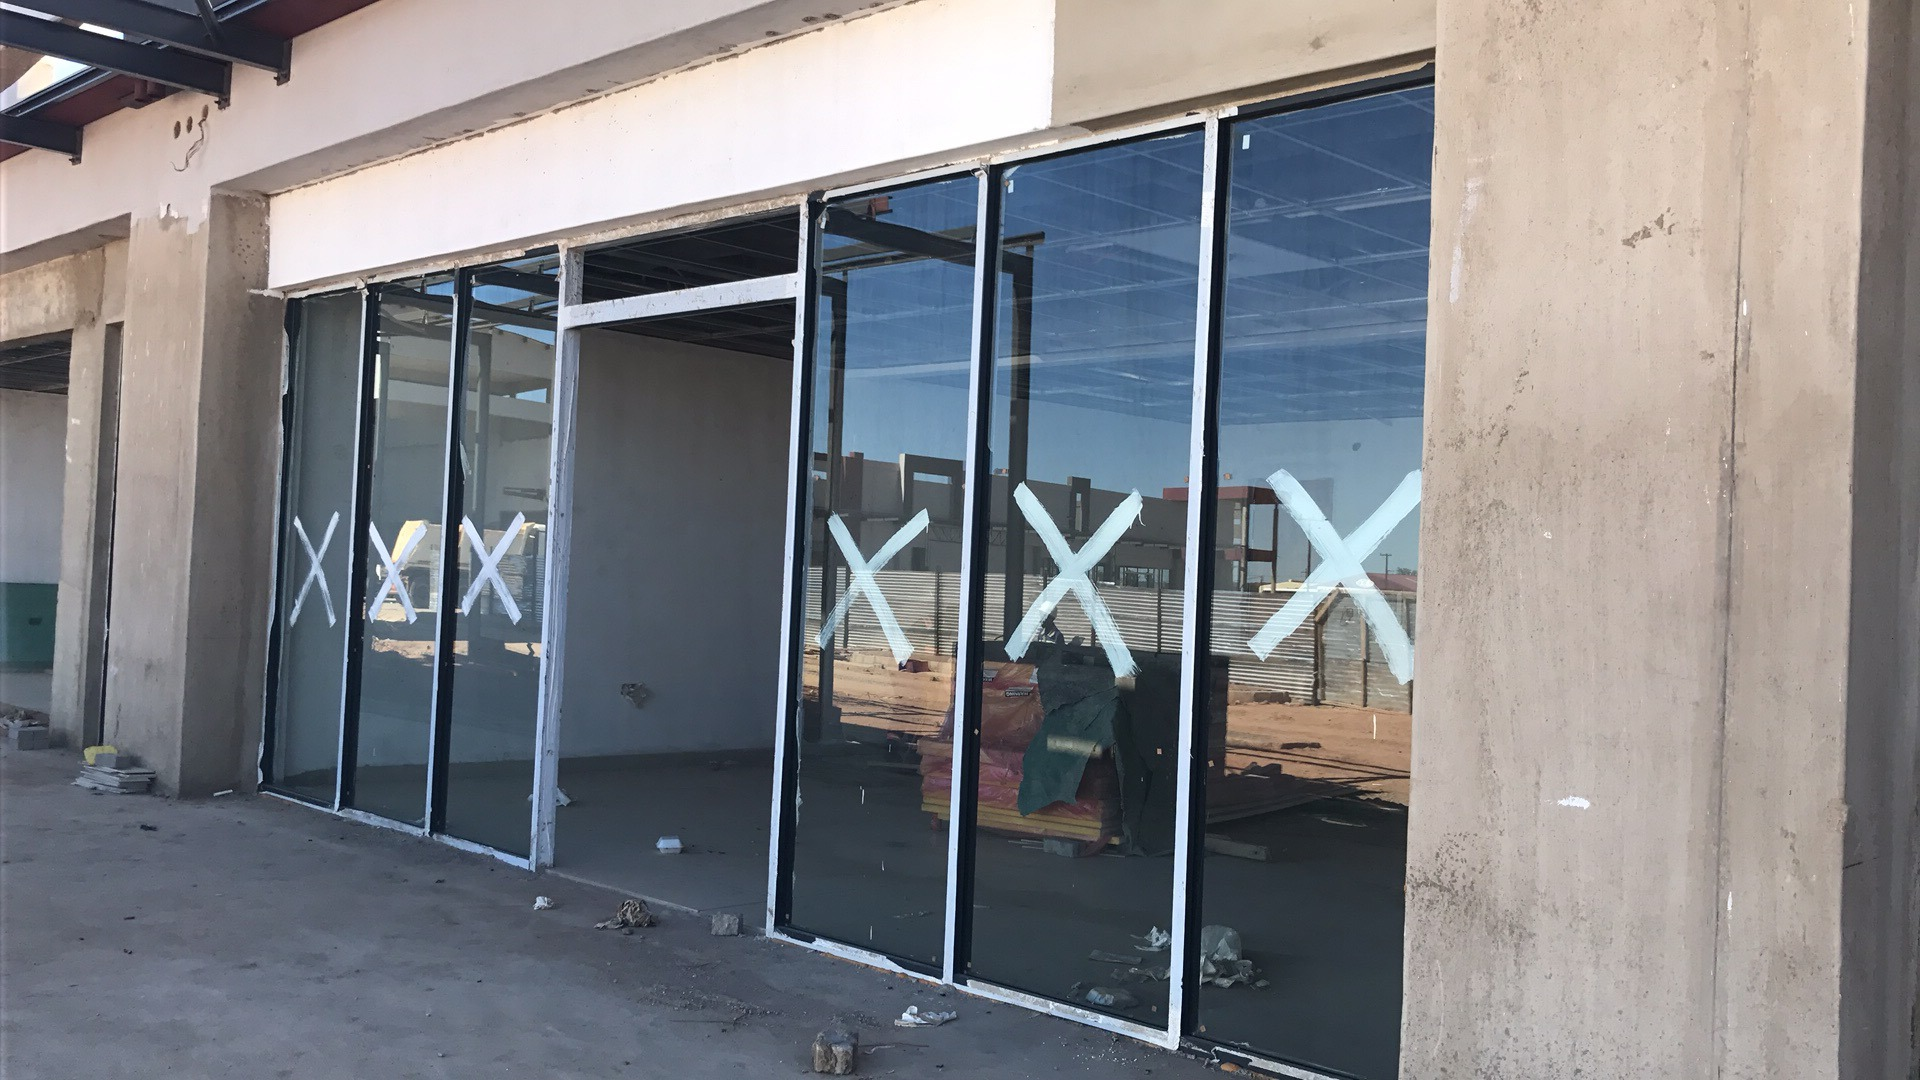 Storefront Windows And Doors [hot item] high quality double glazing aluminum sound proof aluminum  storefront door